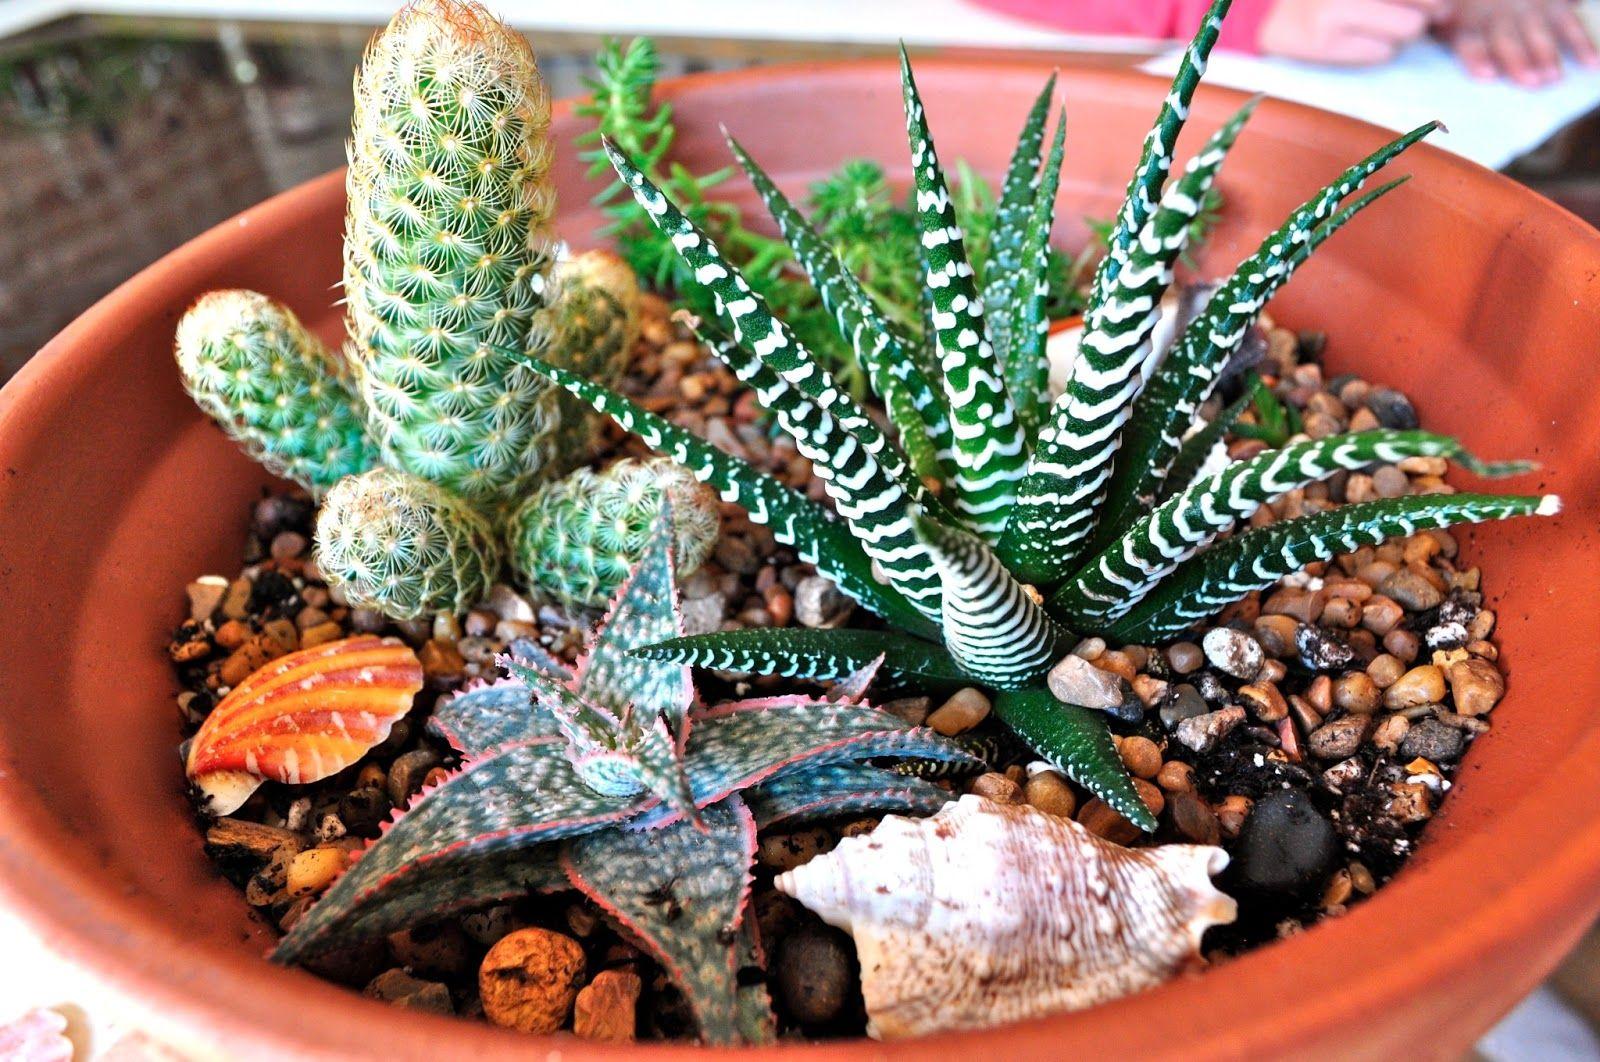 Succulent dish garden ideas my moms cactussucculent dish garden succulent dish garden ideas my moms cactussucculent dish garden she used the workwithnaturefo